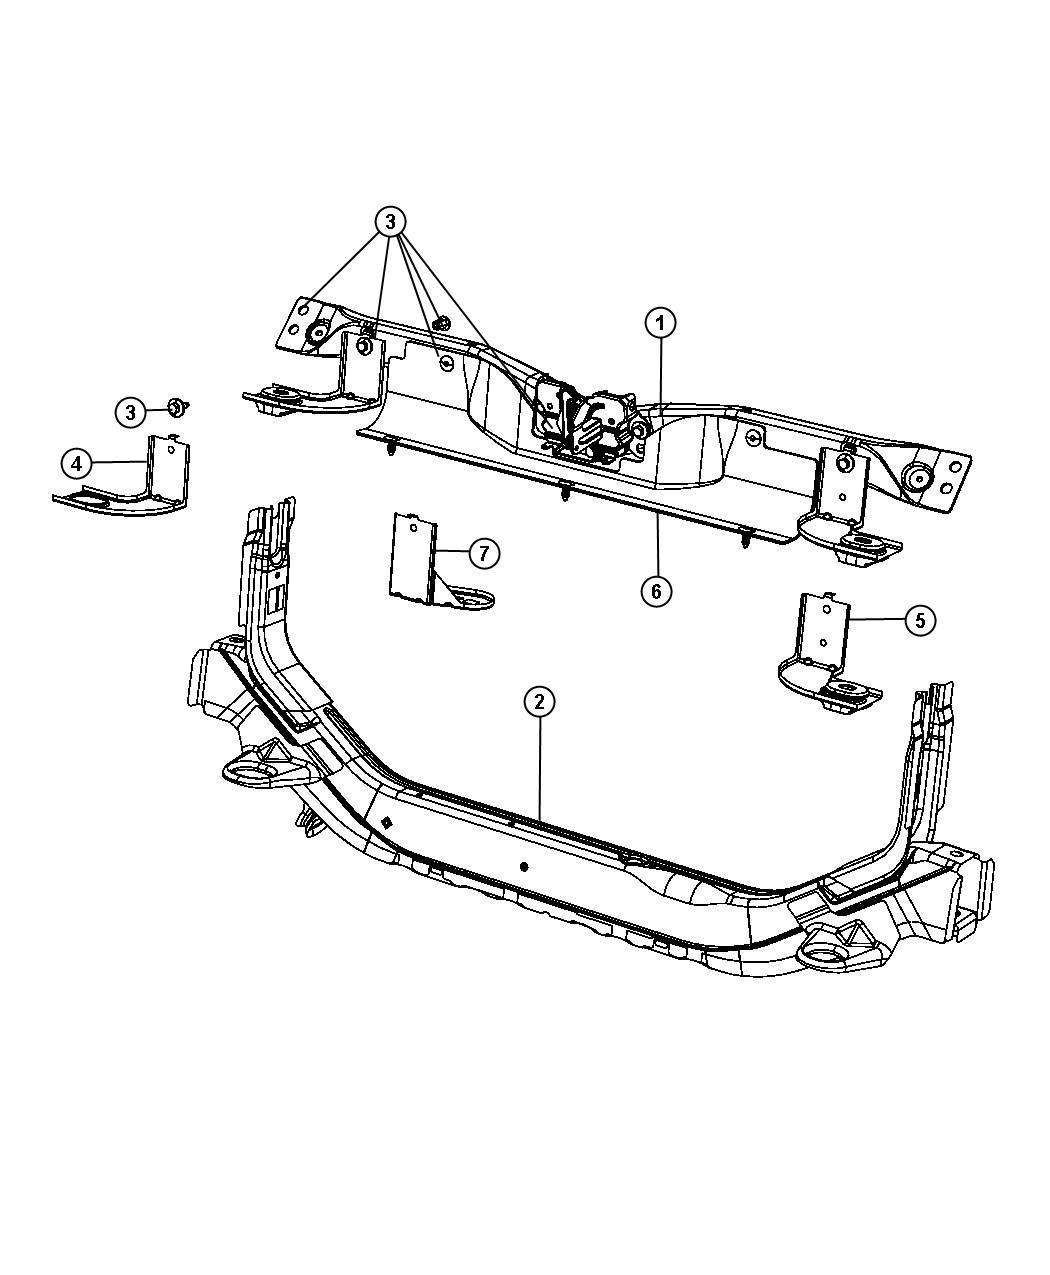 2013 Jeep Compass Crossmember. Radiator closure panel